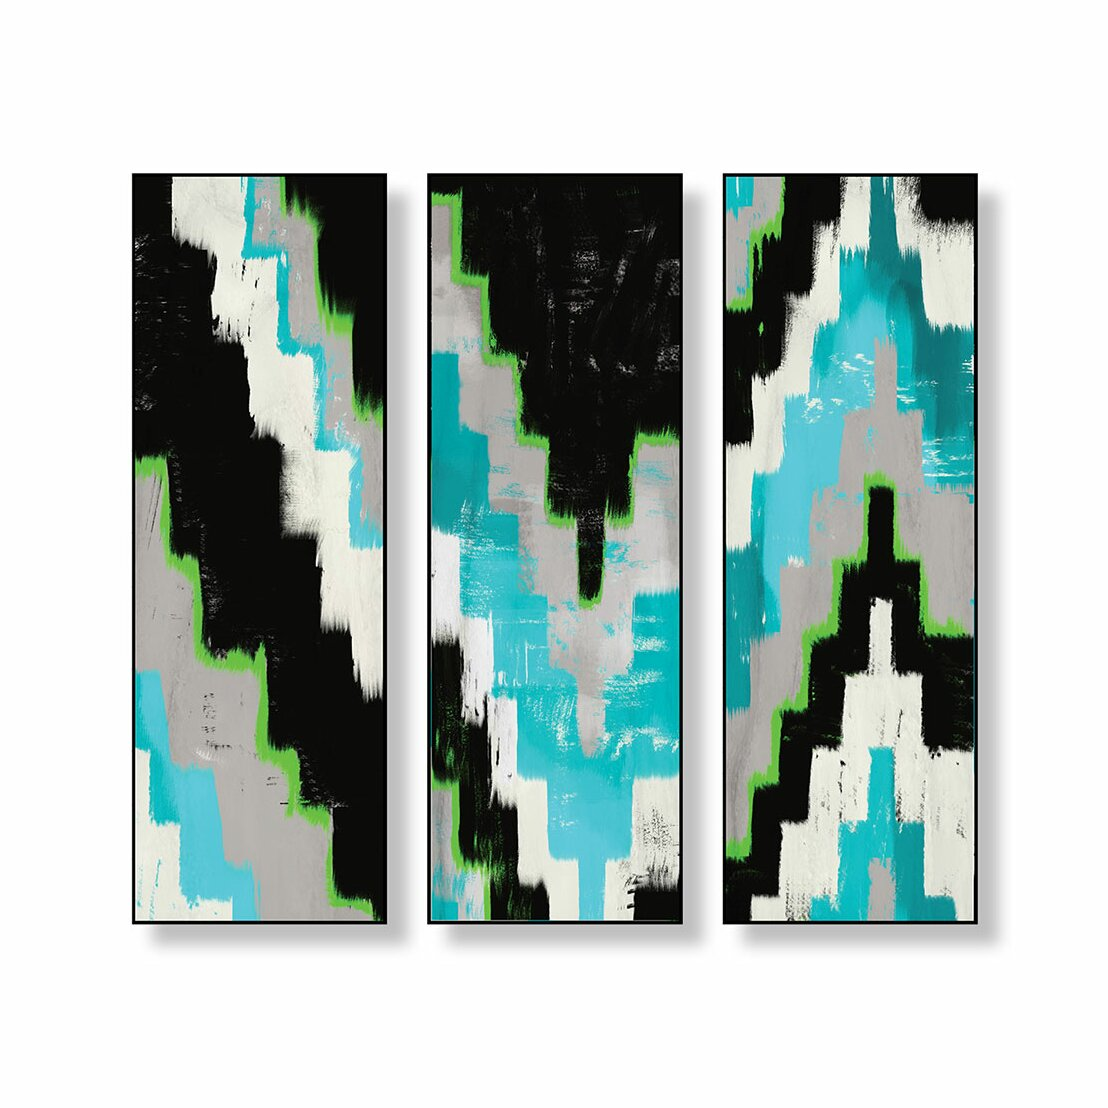 3 Piece Utensil Wall Décor Set : Kilim piece wall decor set wayfair